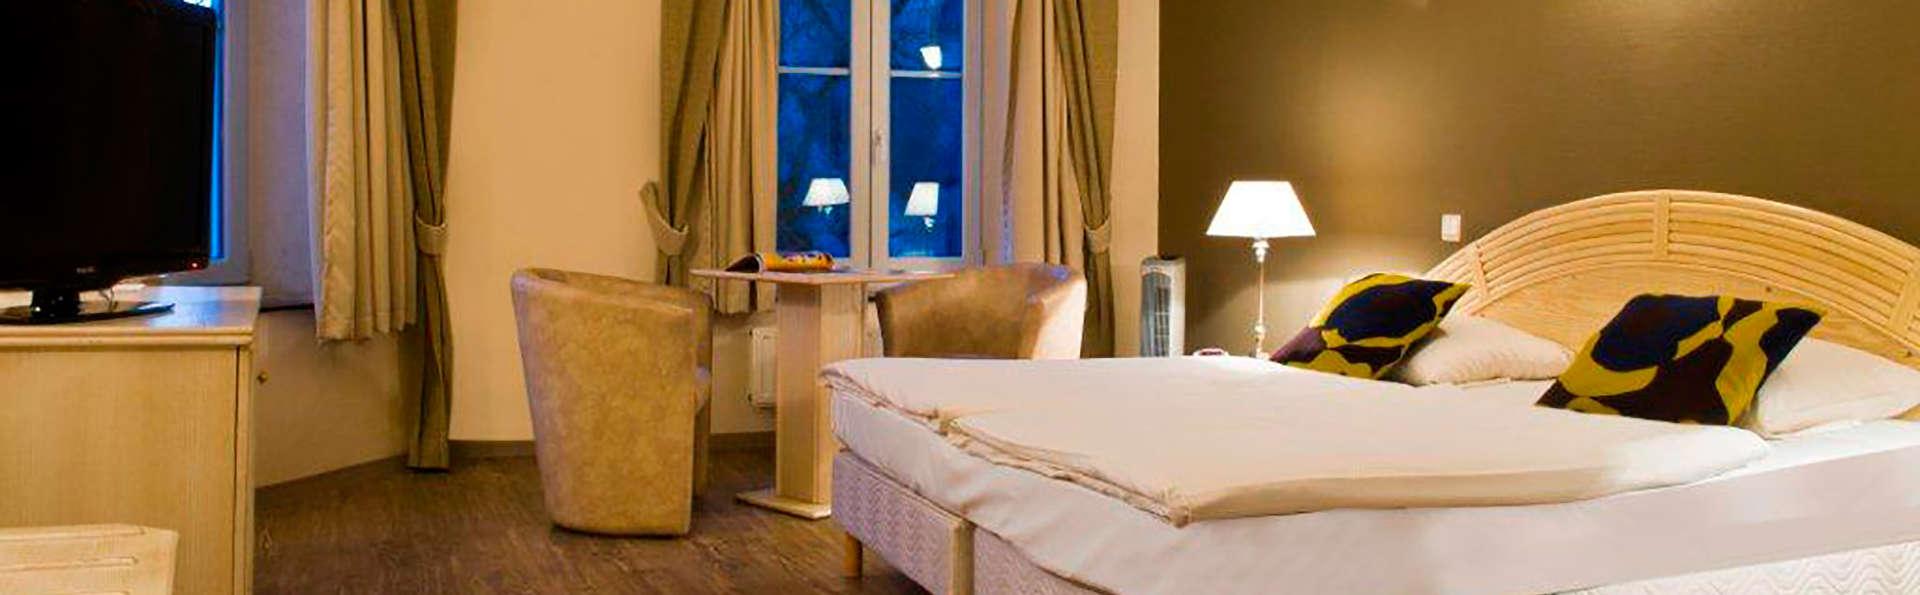 Cocoon Hotel Grenier des Grottes - EDIT_room.jpg